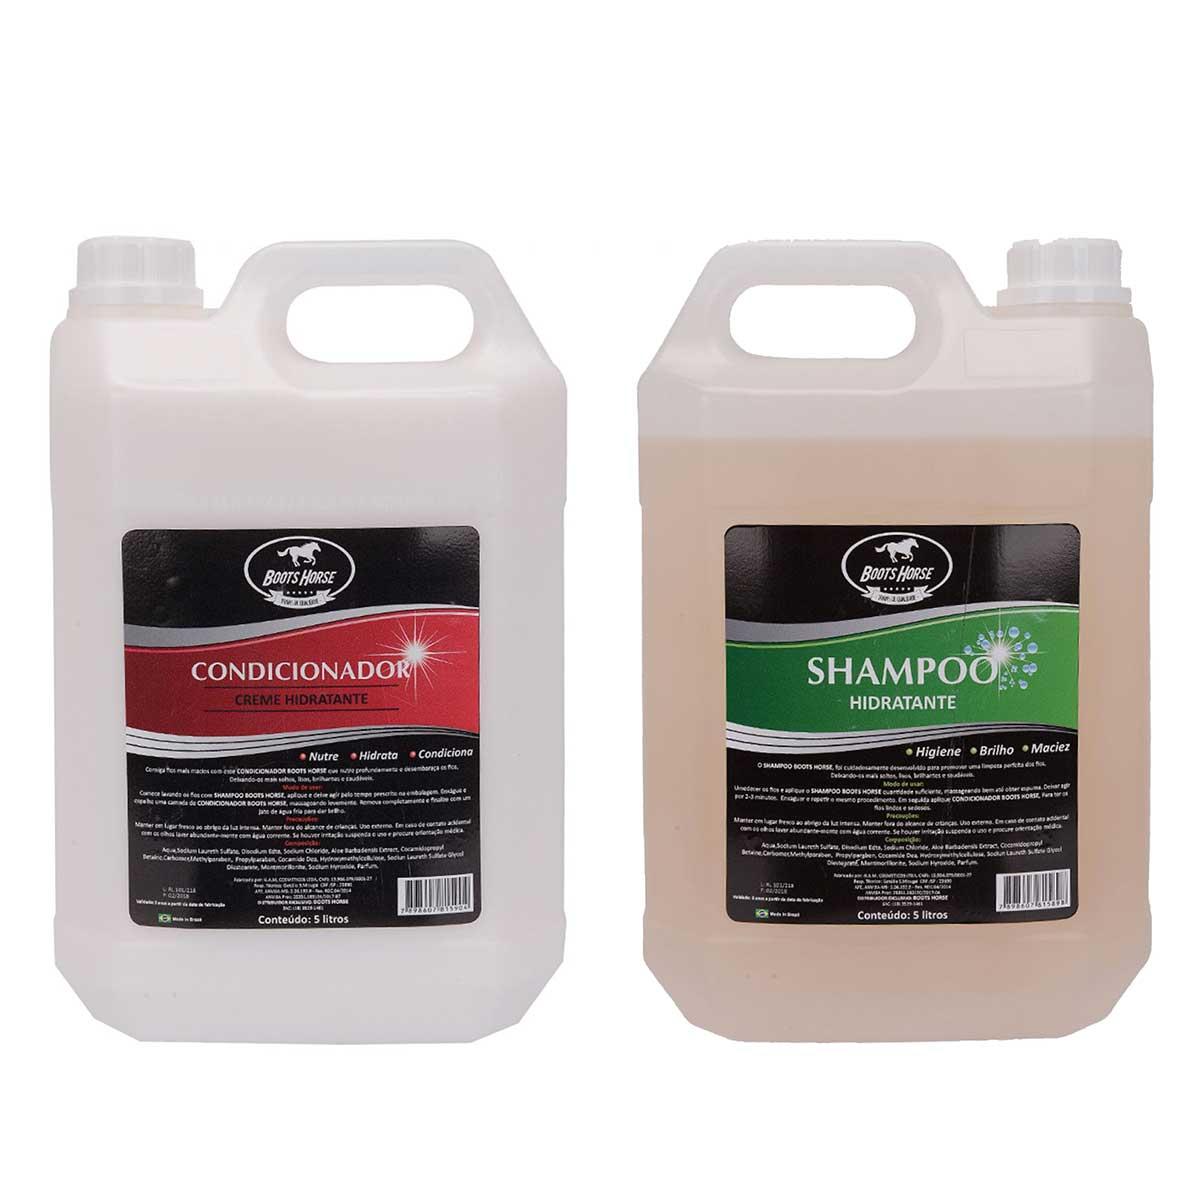 Kit Shampoo E Condicionador Boots Horse 5 Litros